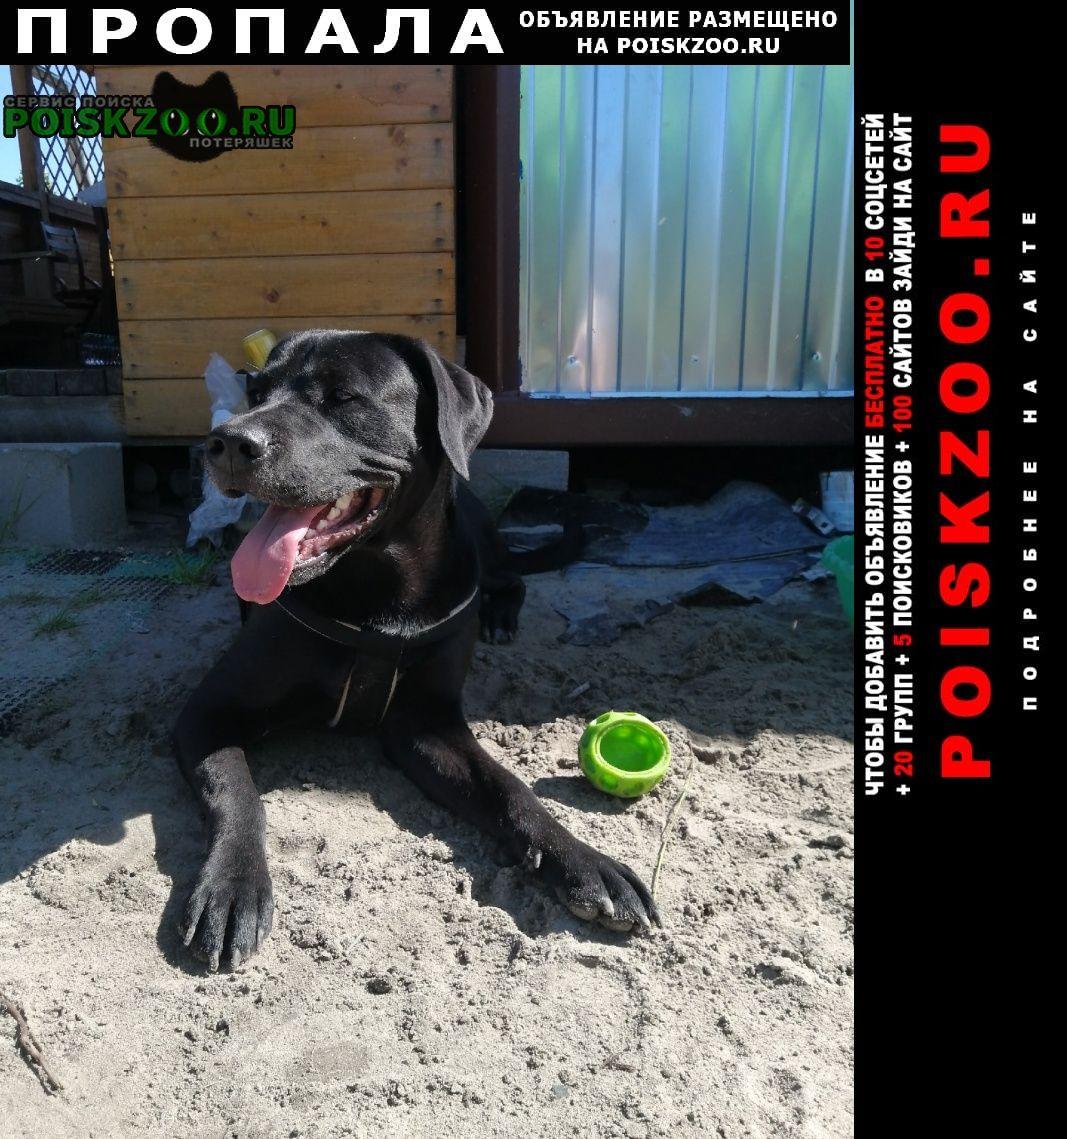 Пропала собака Электрогорск